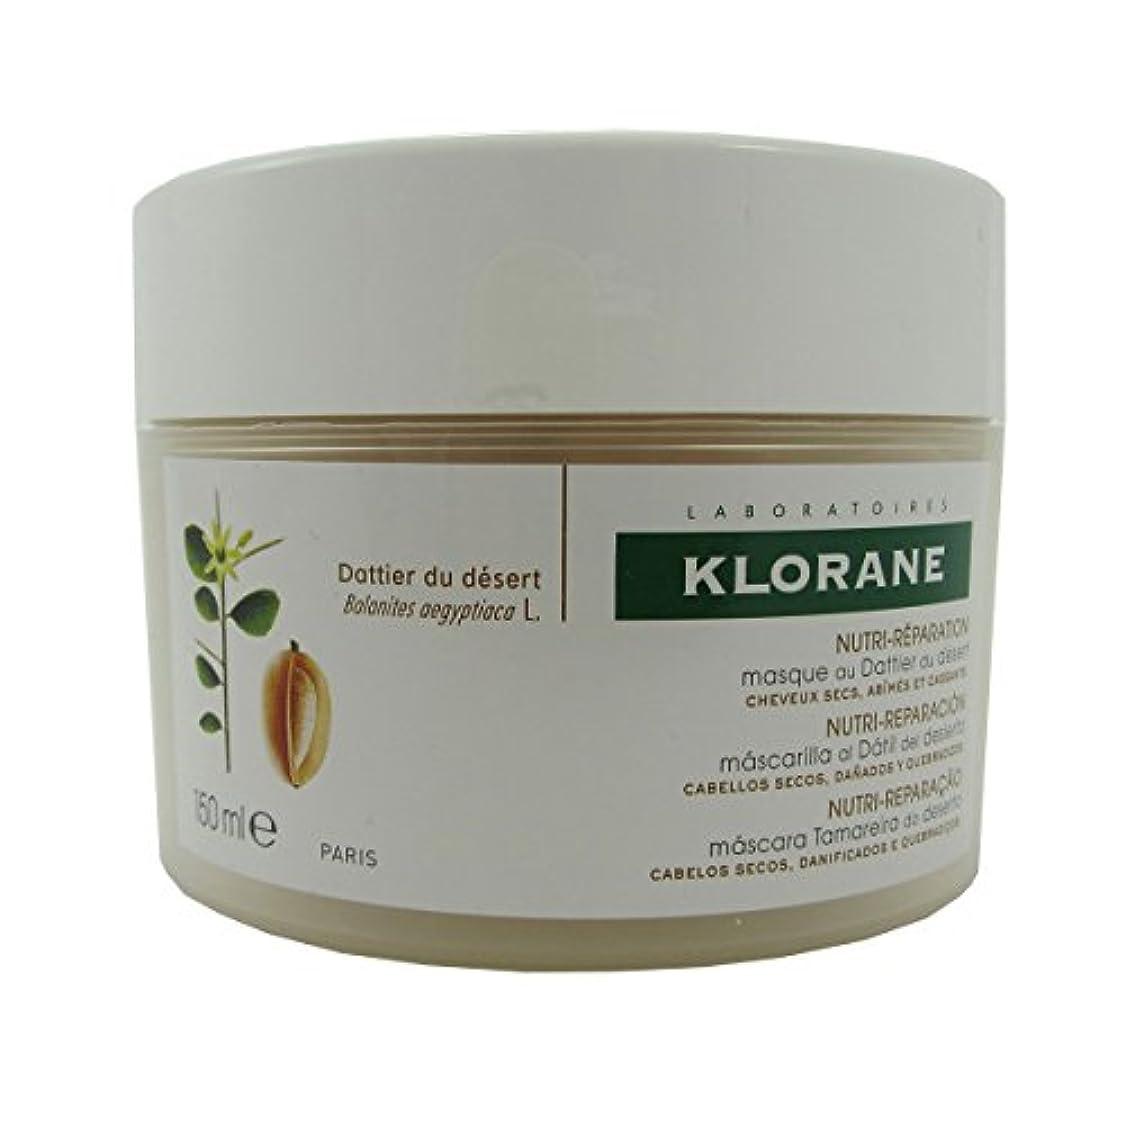 Klorane Desert Date Mask 150ml [並行輸入品]